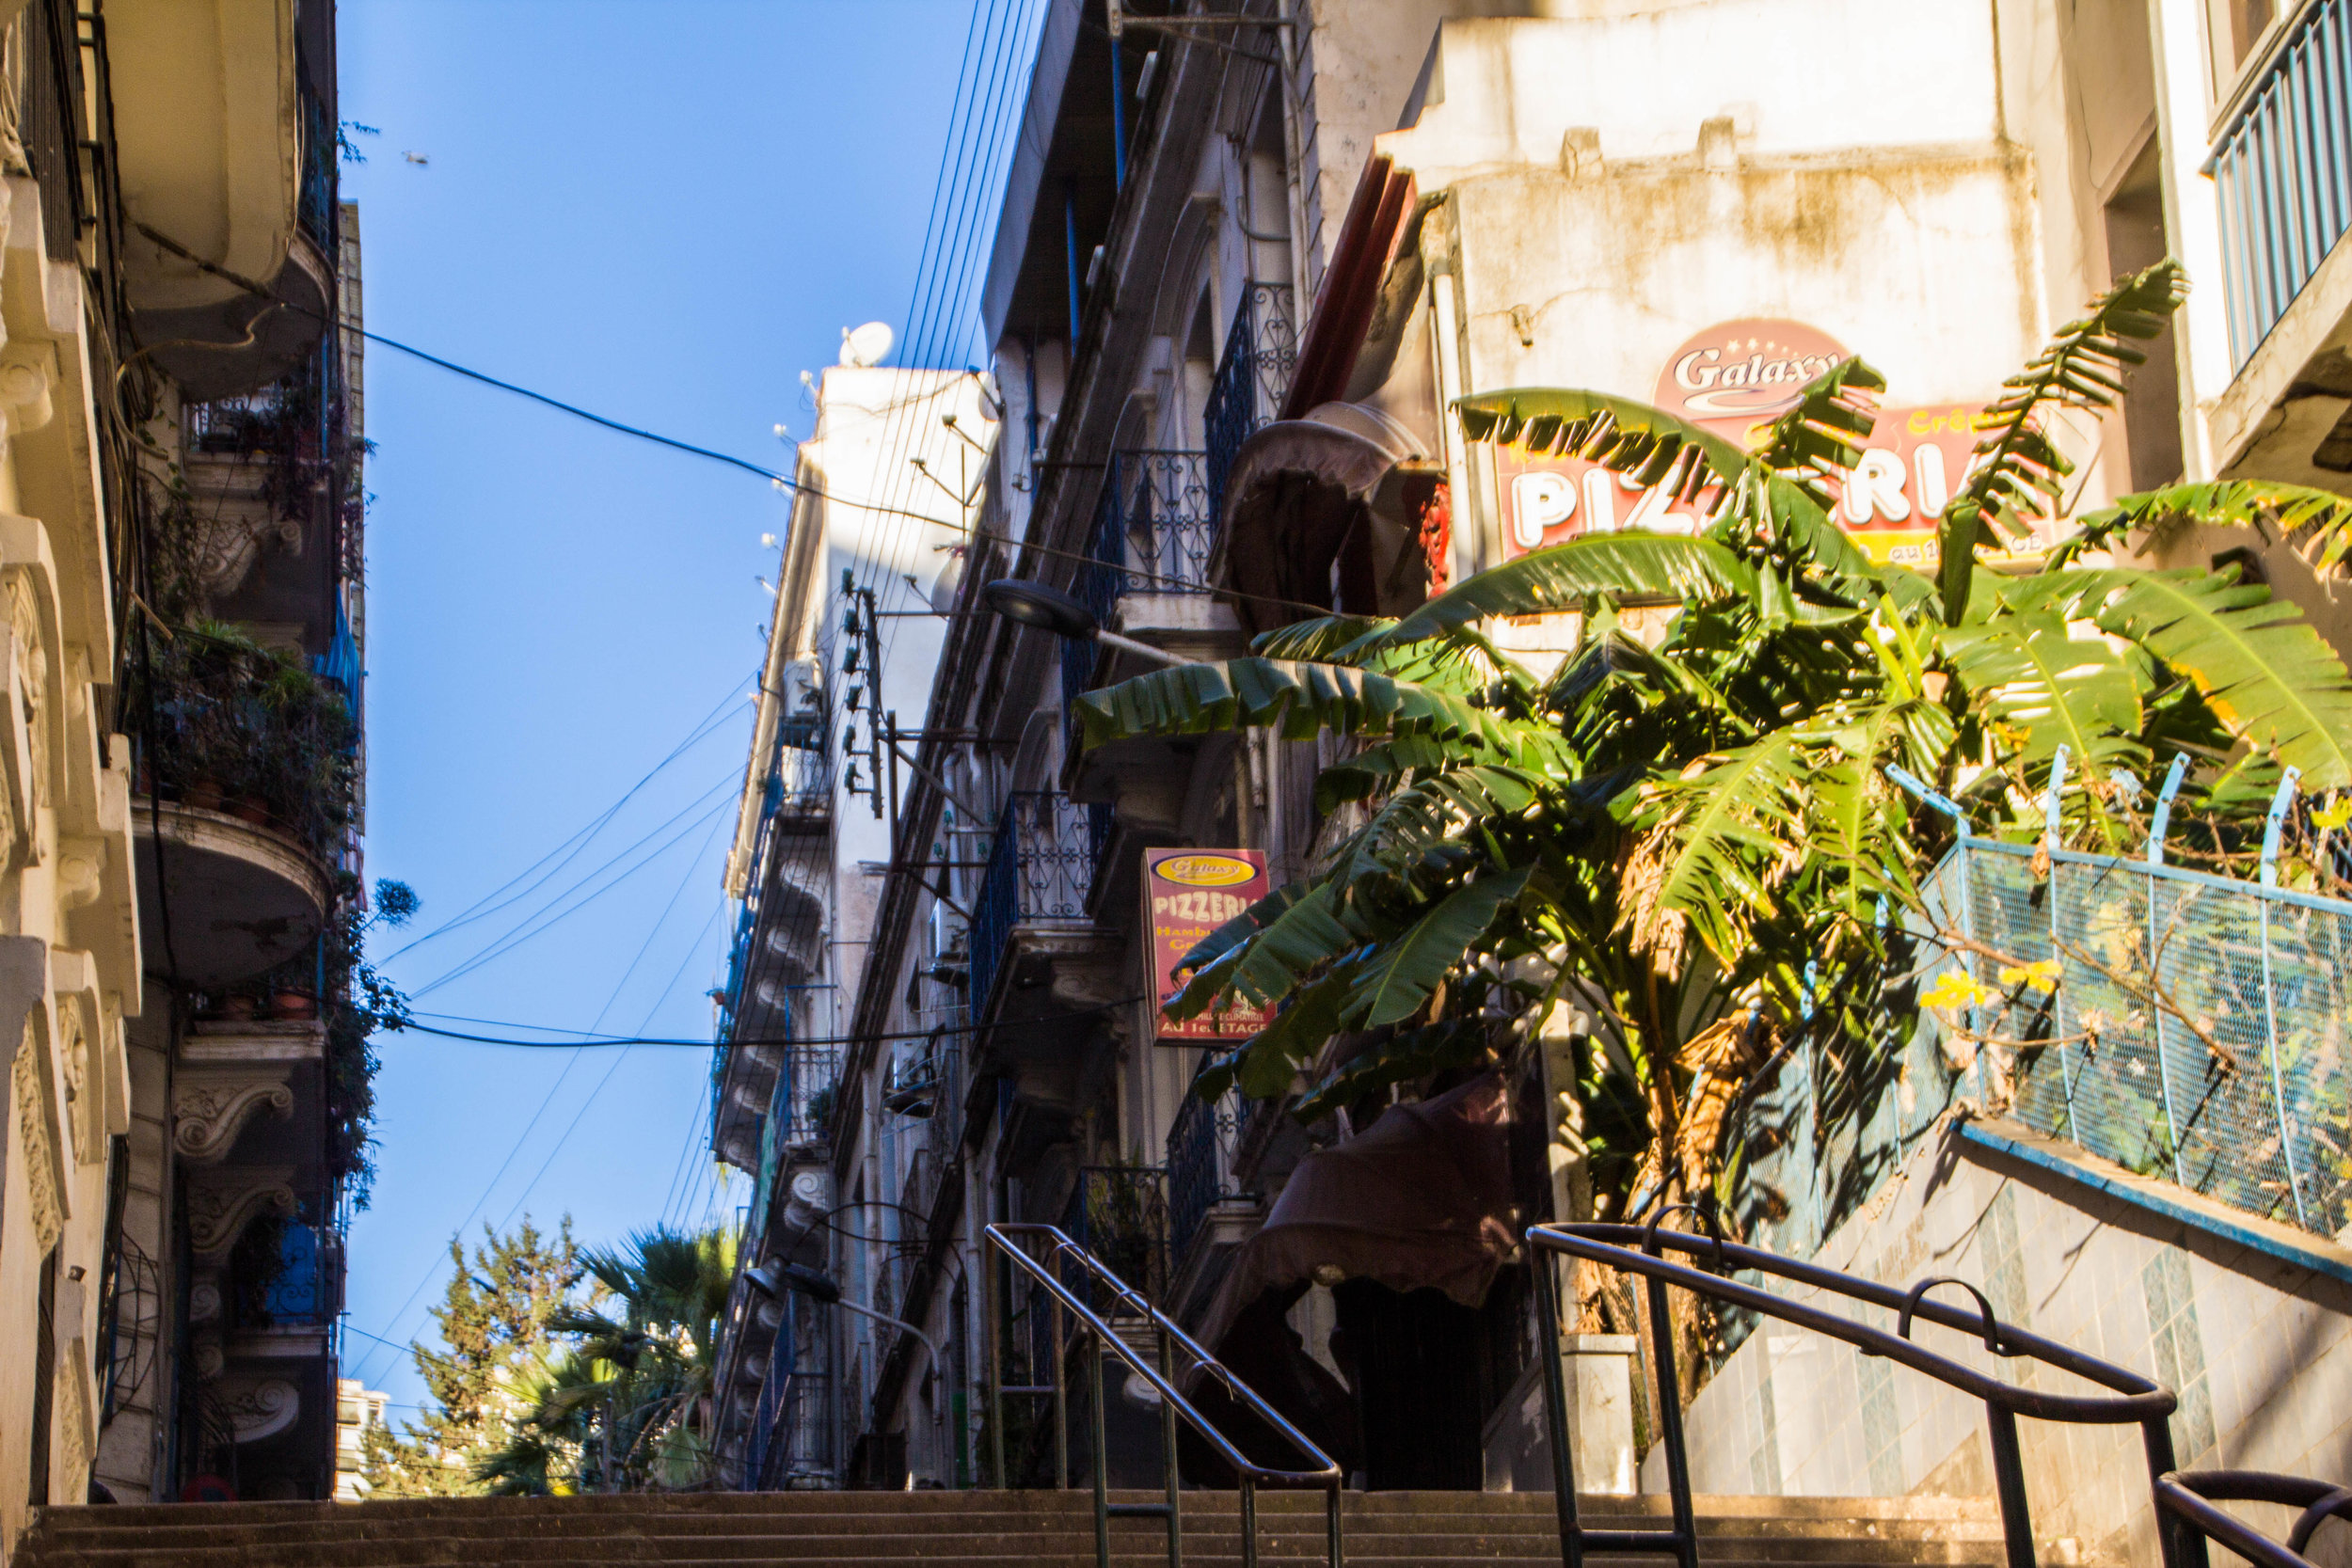 street-photography-algiers-algeria-6.jpg